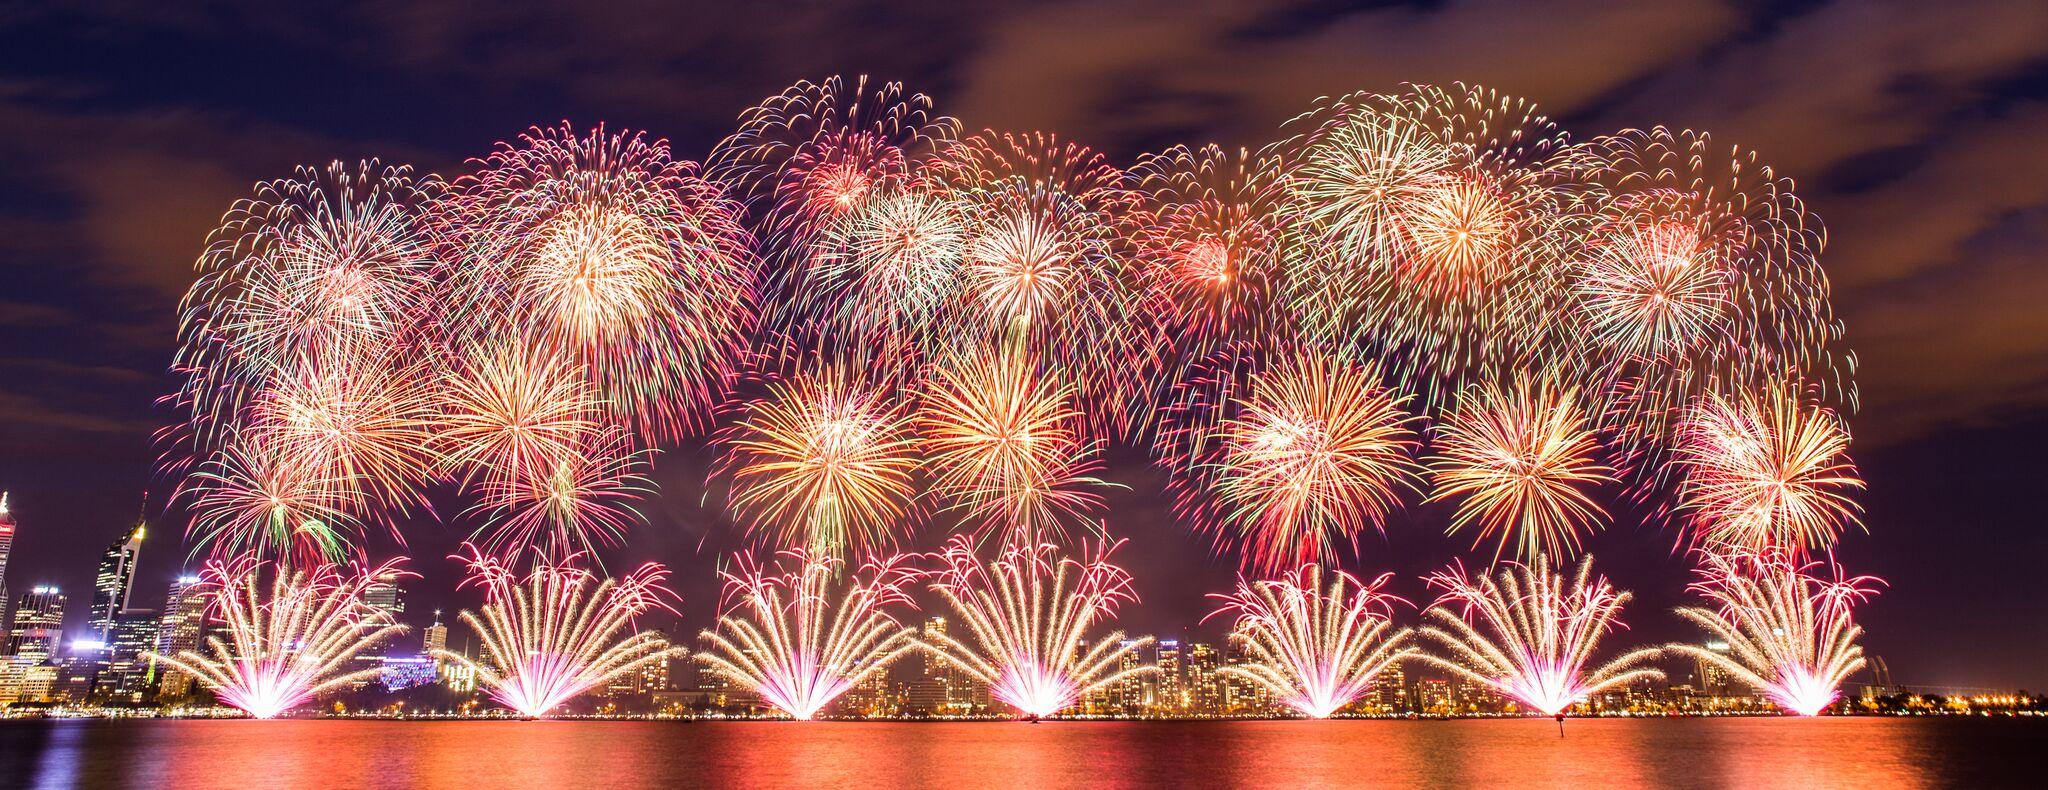 AustraliaDay_Fireworks.jpeg